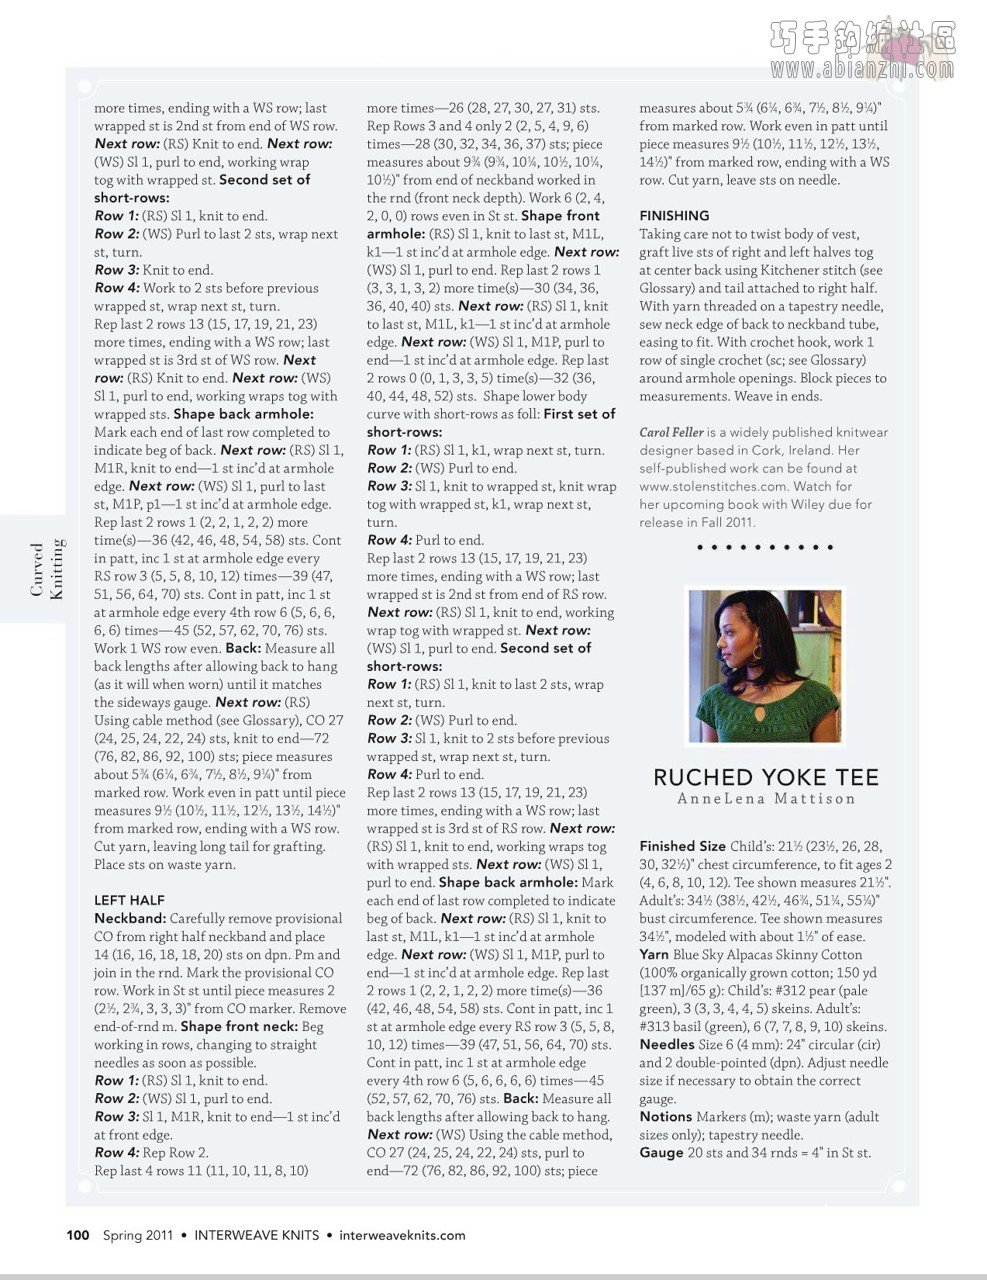 IWKSp11_page102_image1.jpg